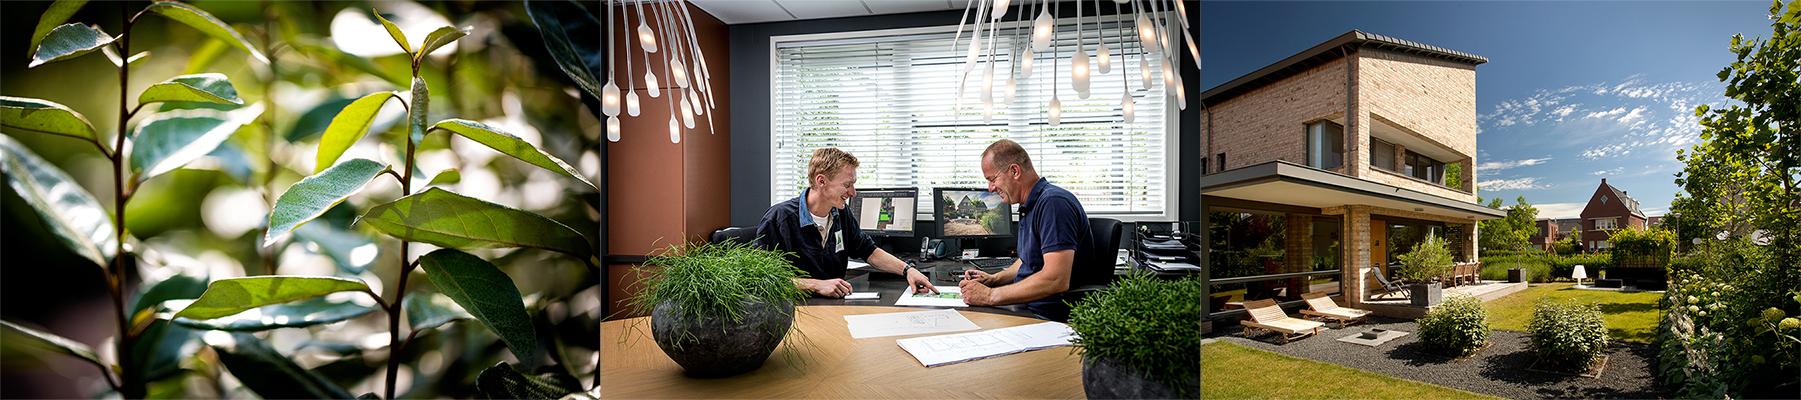 Hoveniers bedrijf brand, tuinaanleg, tuinontwerp, tuinonderhoud, bestrating, Joost Brand, Oudewater, Cojan van Toor Professional Photography